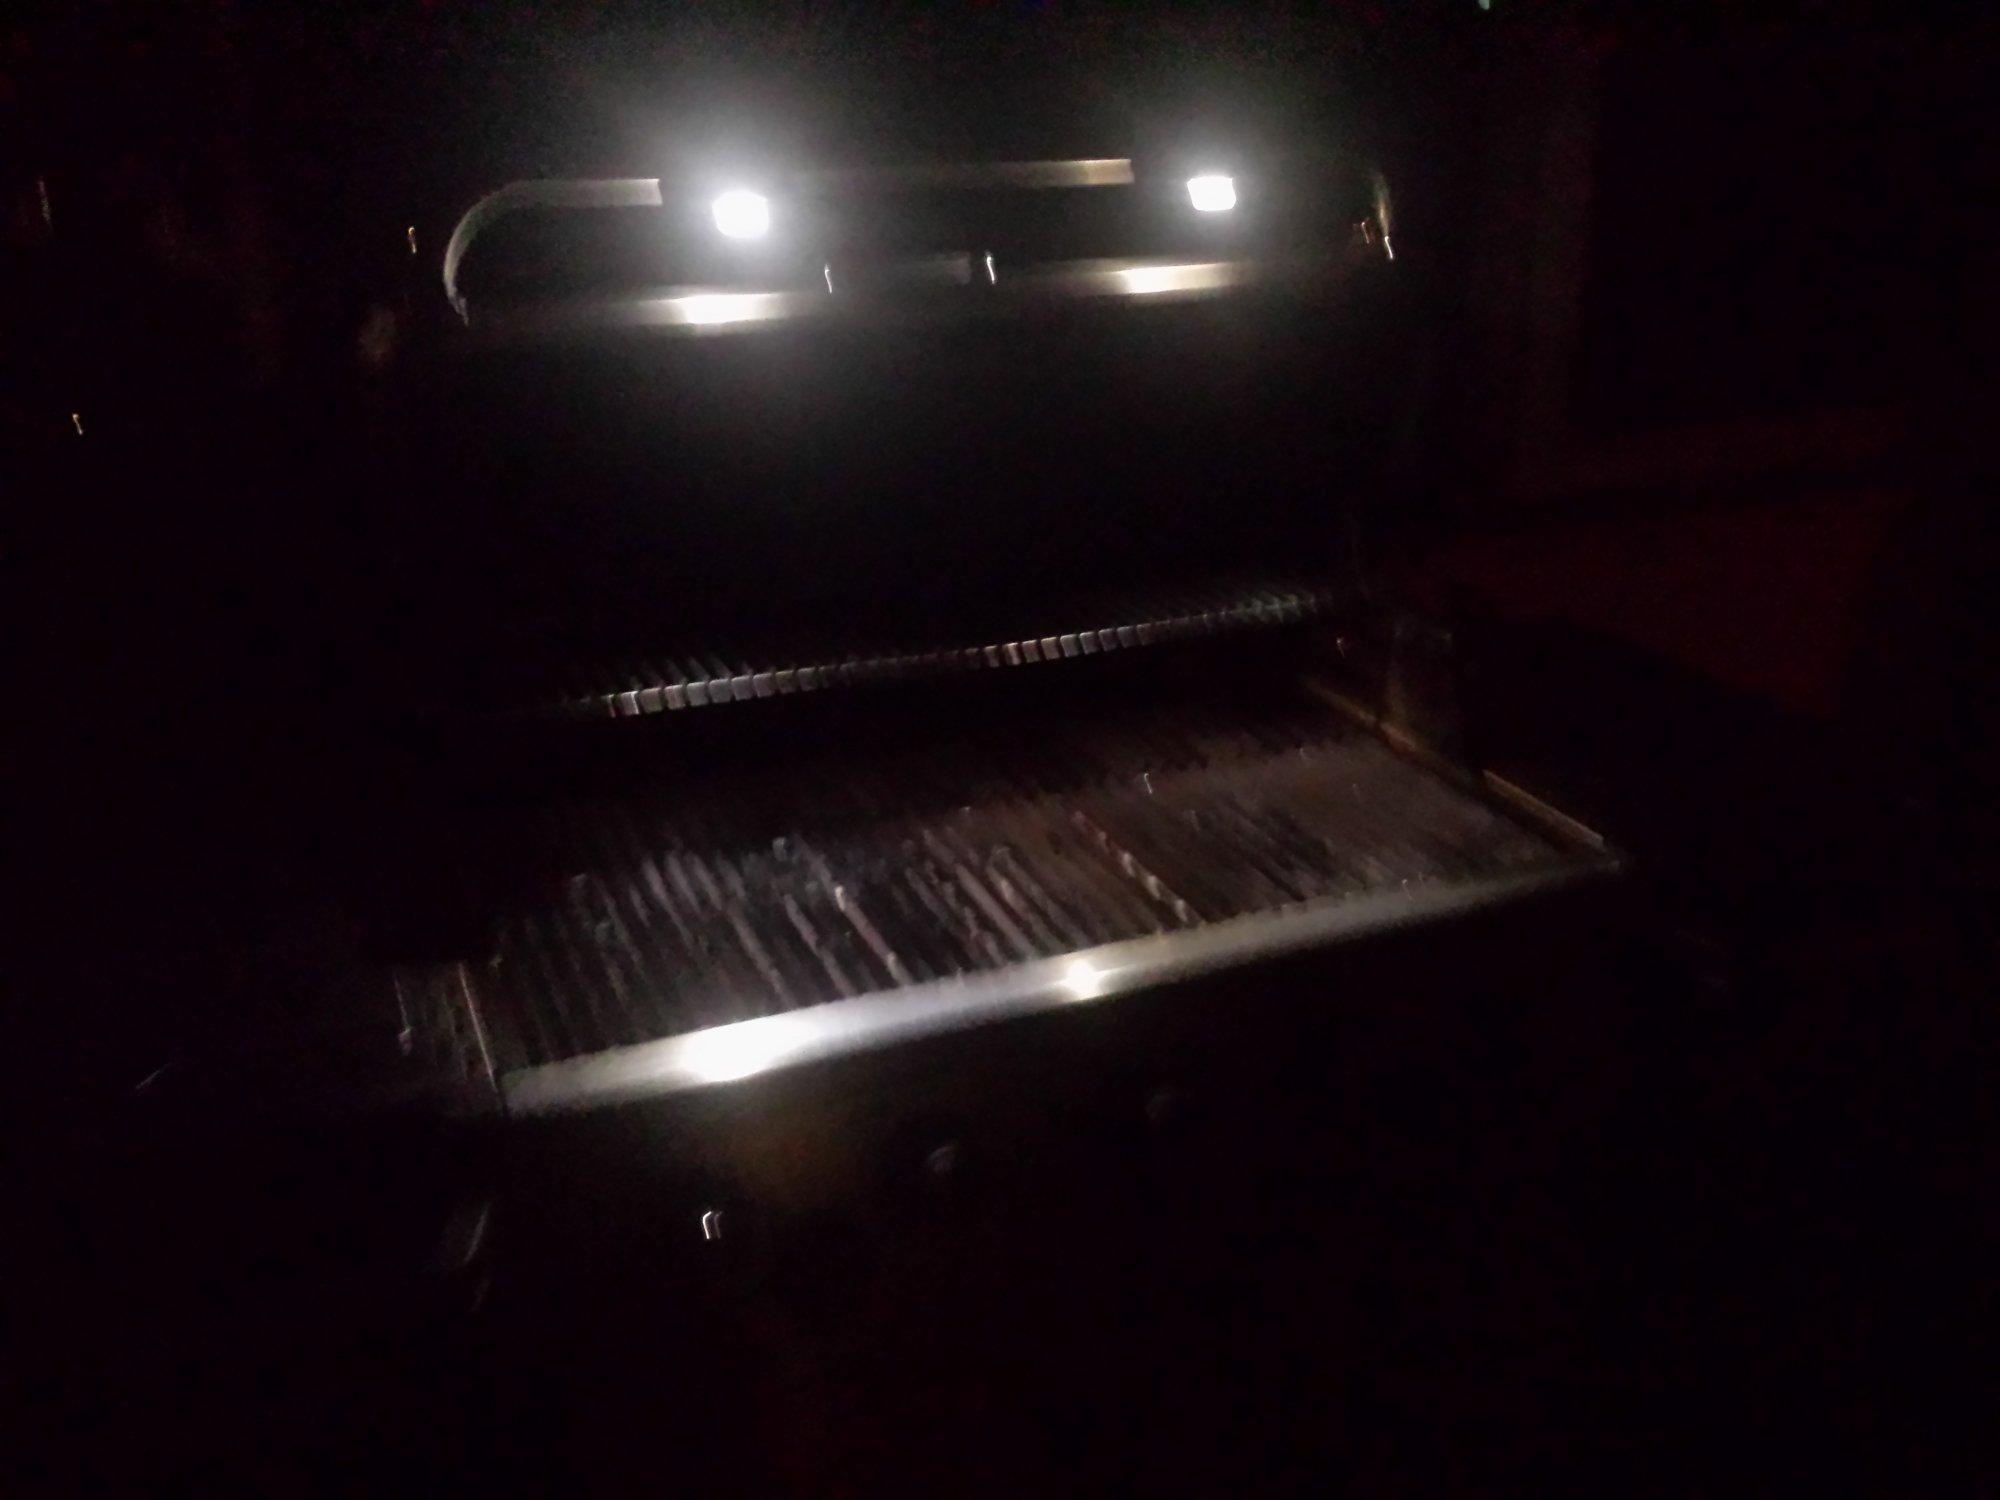 Enders Gasgrill Lincoln 2 Abdeckung : Edelstahl gasgrill edelstahl rohrbrenner leicht zu reinigen